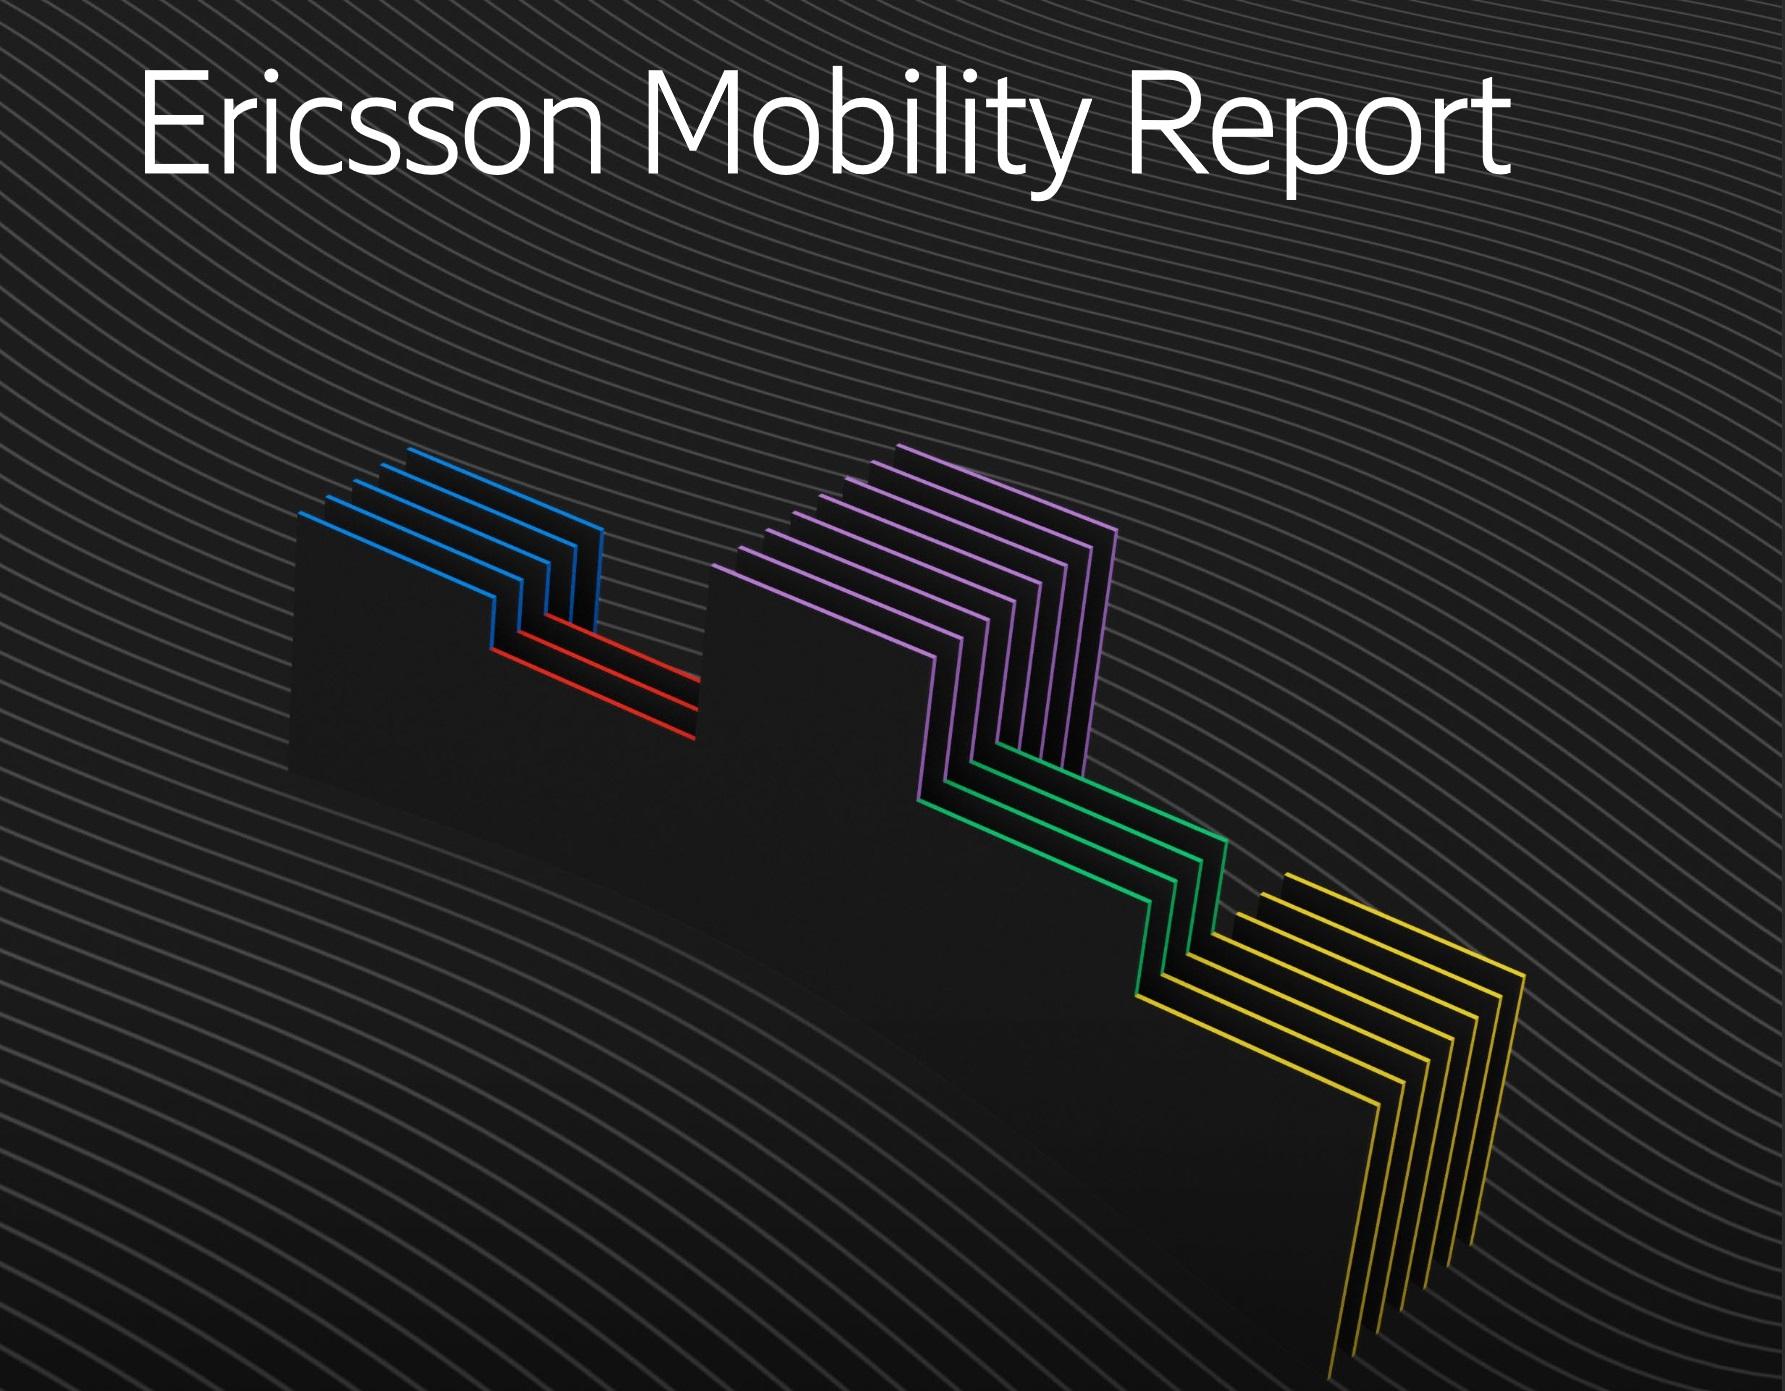 Ericsson-Mobility-Report-2019